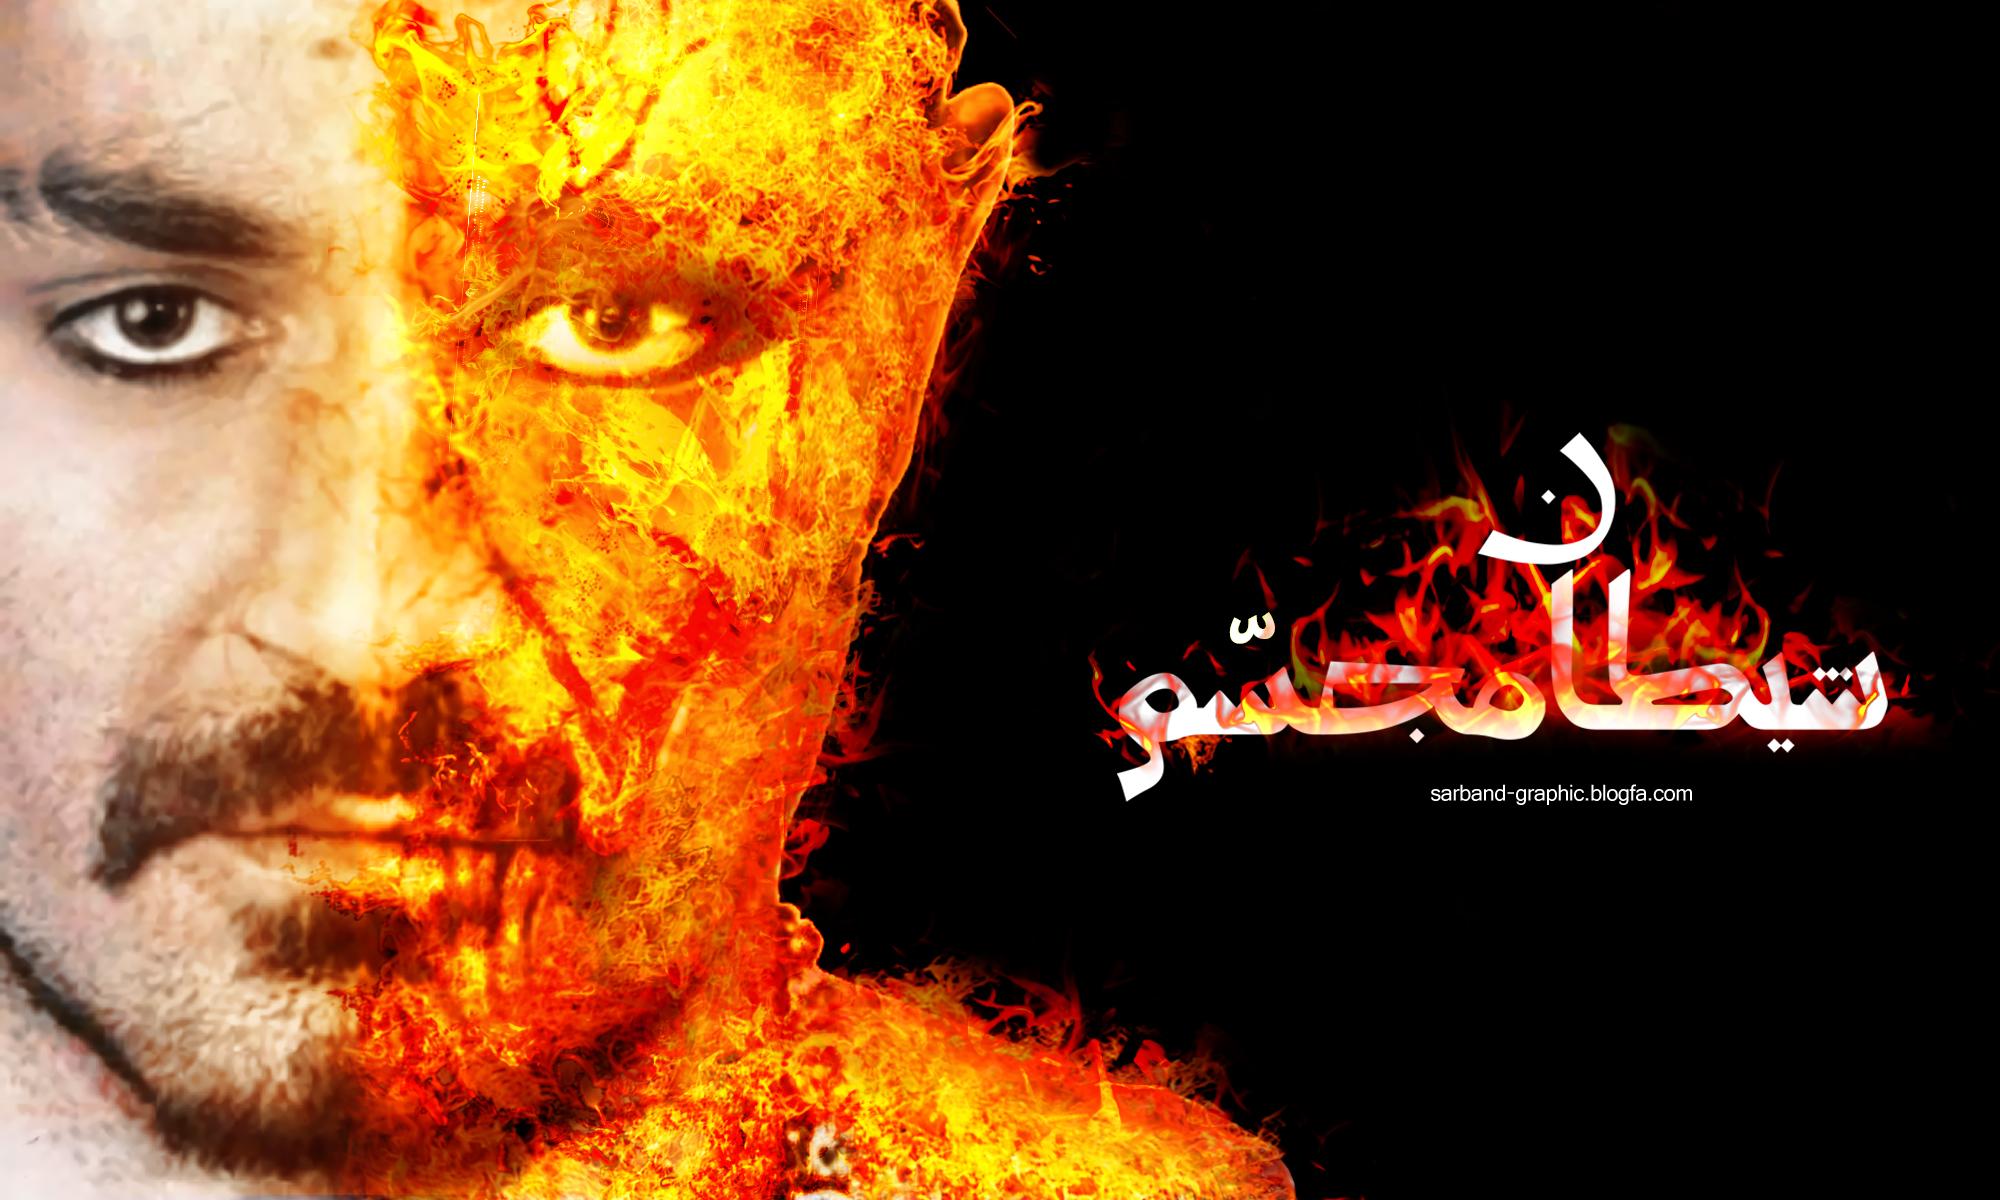 توهین جدید شاهین نجفی ( لعنت الله علیه ) به حضرت ابوالفضل ، علمدار کربلا + عکس